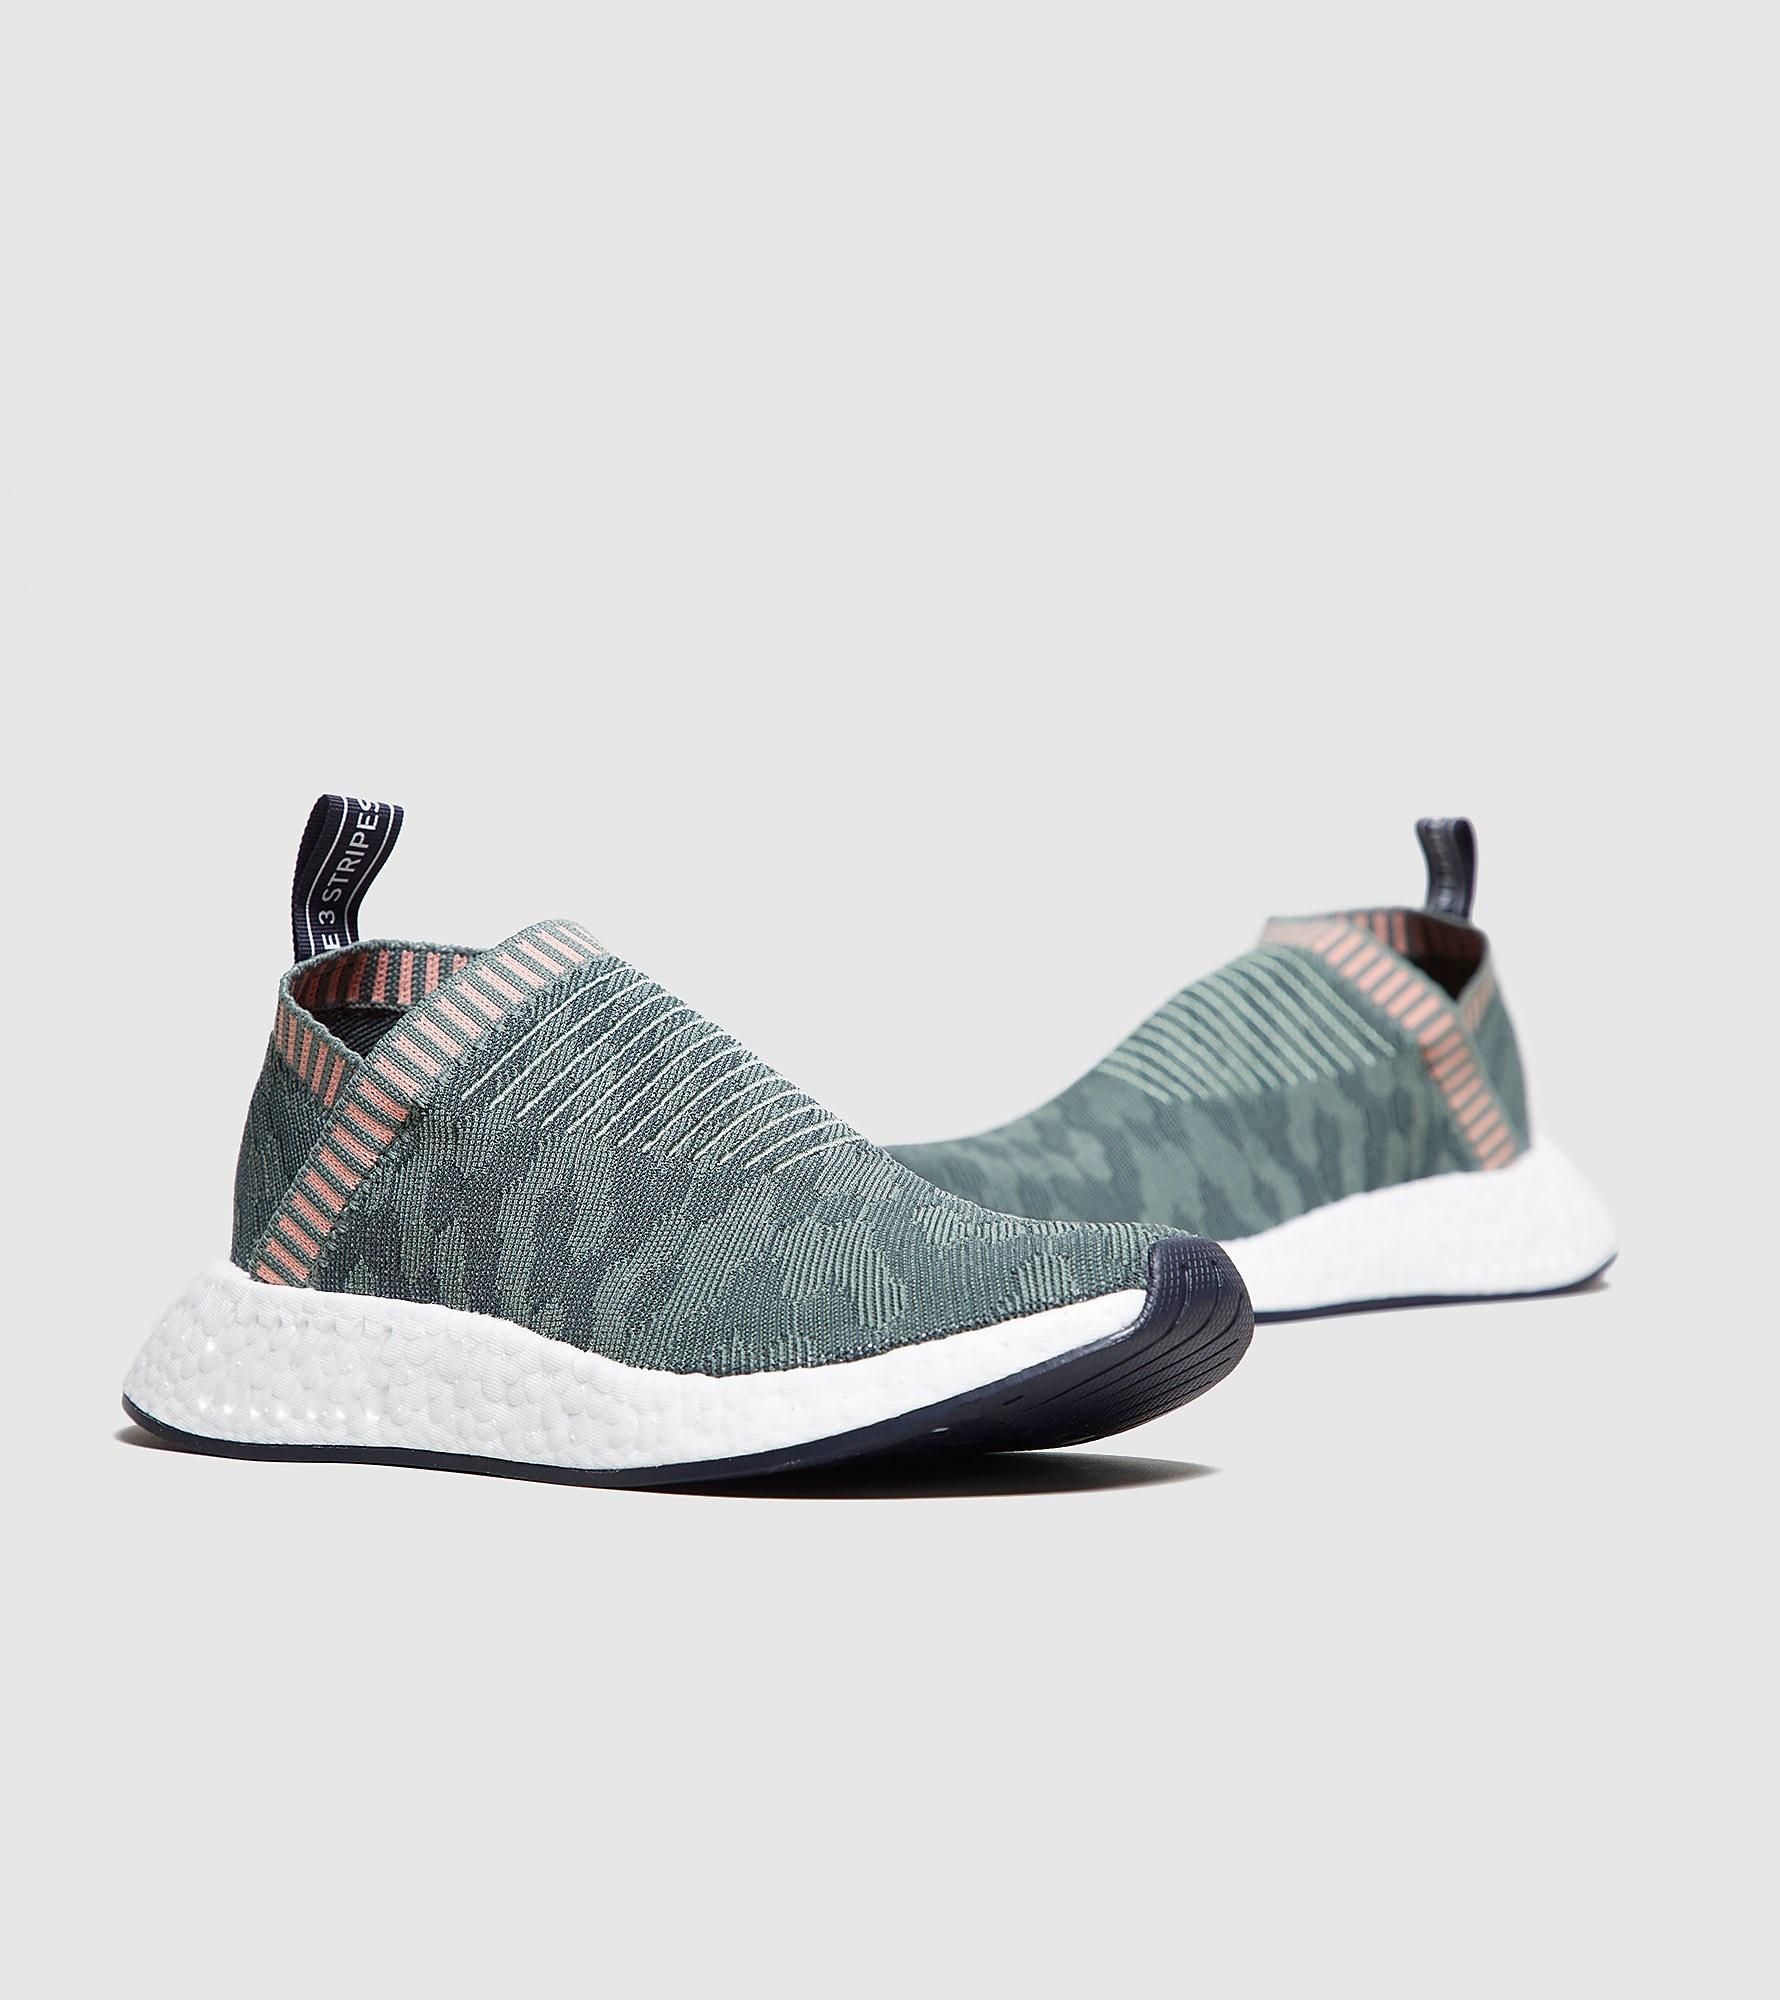 adidas Originals NMD City Sock Boost Femme